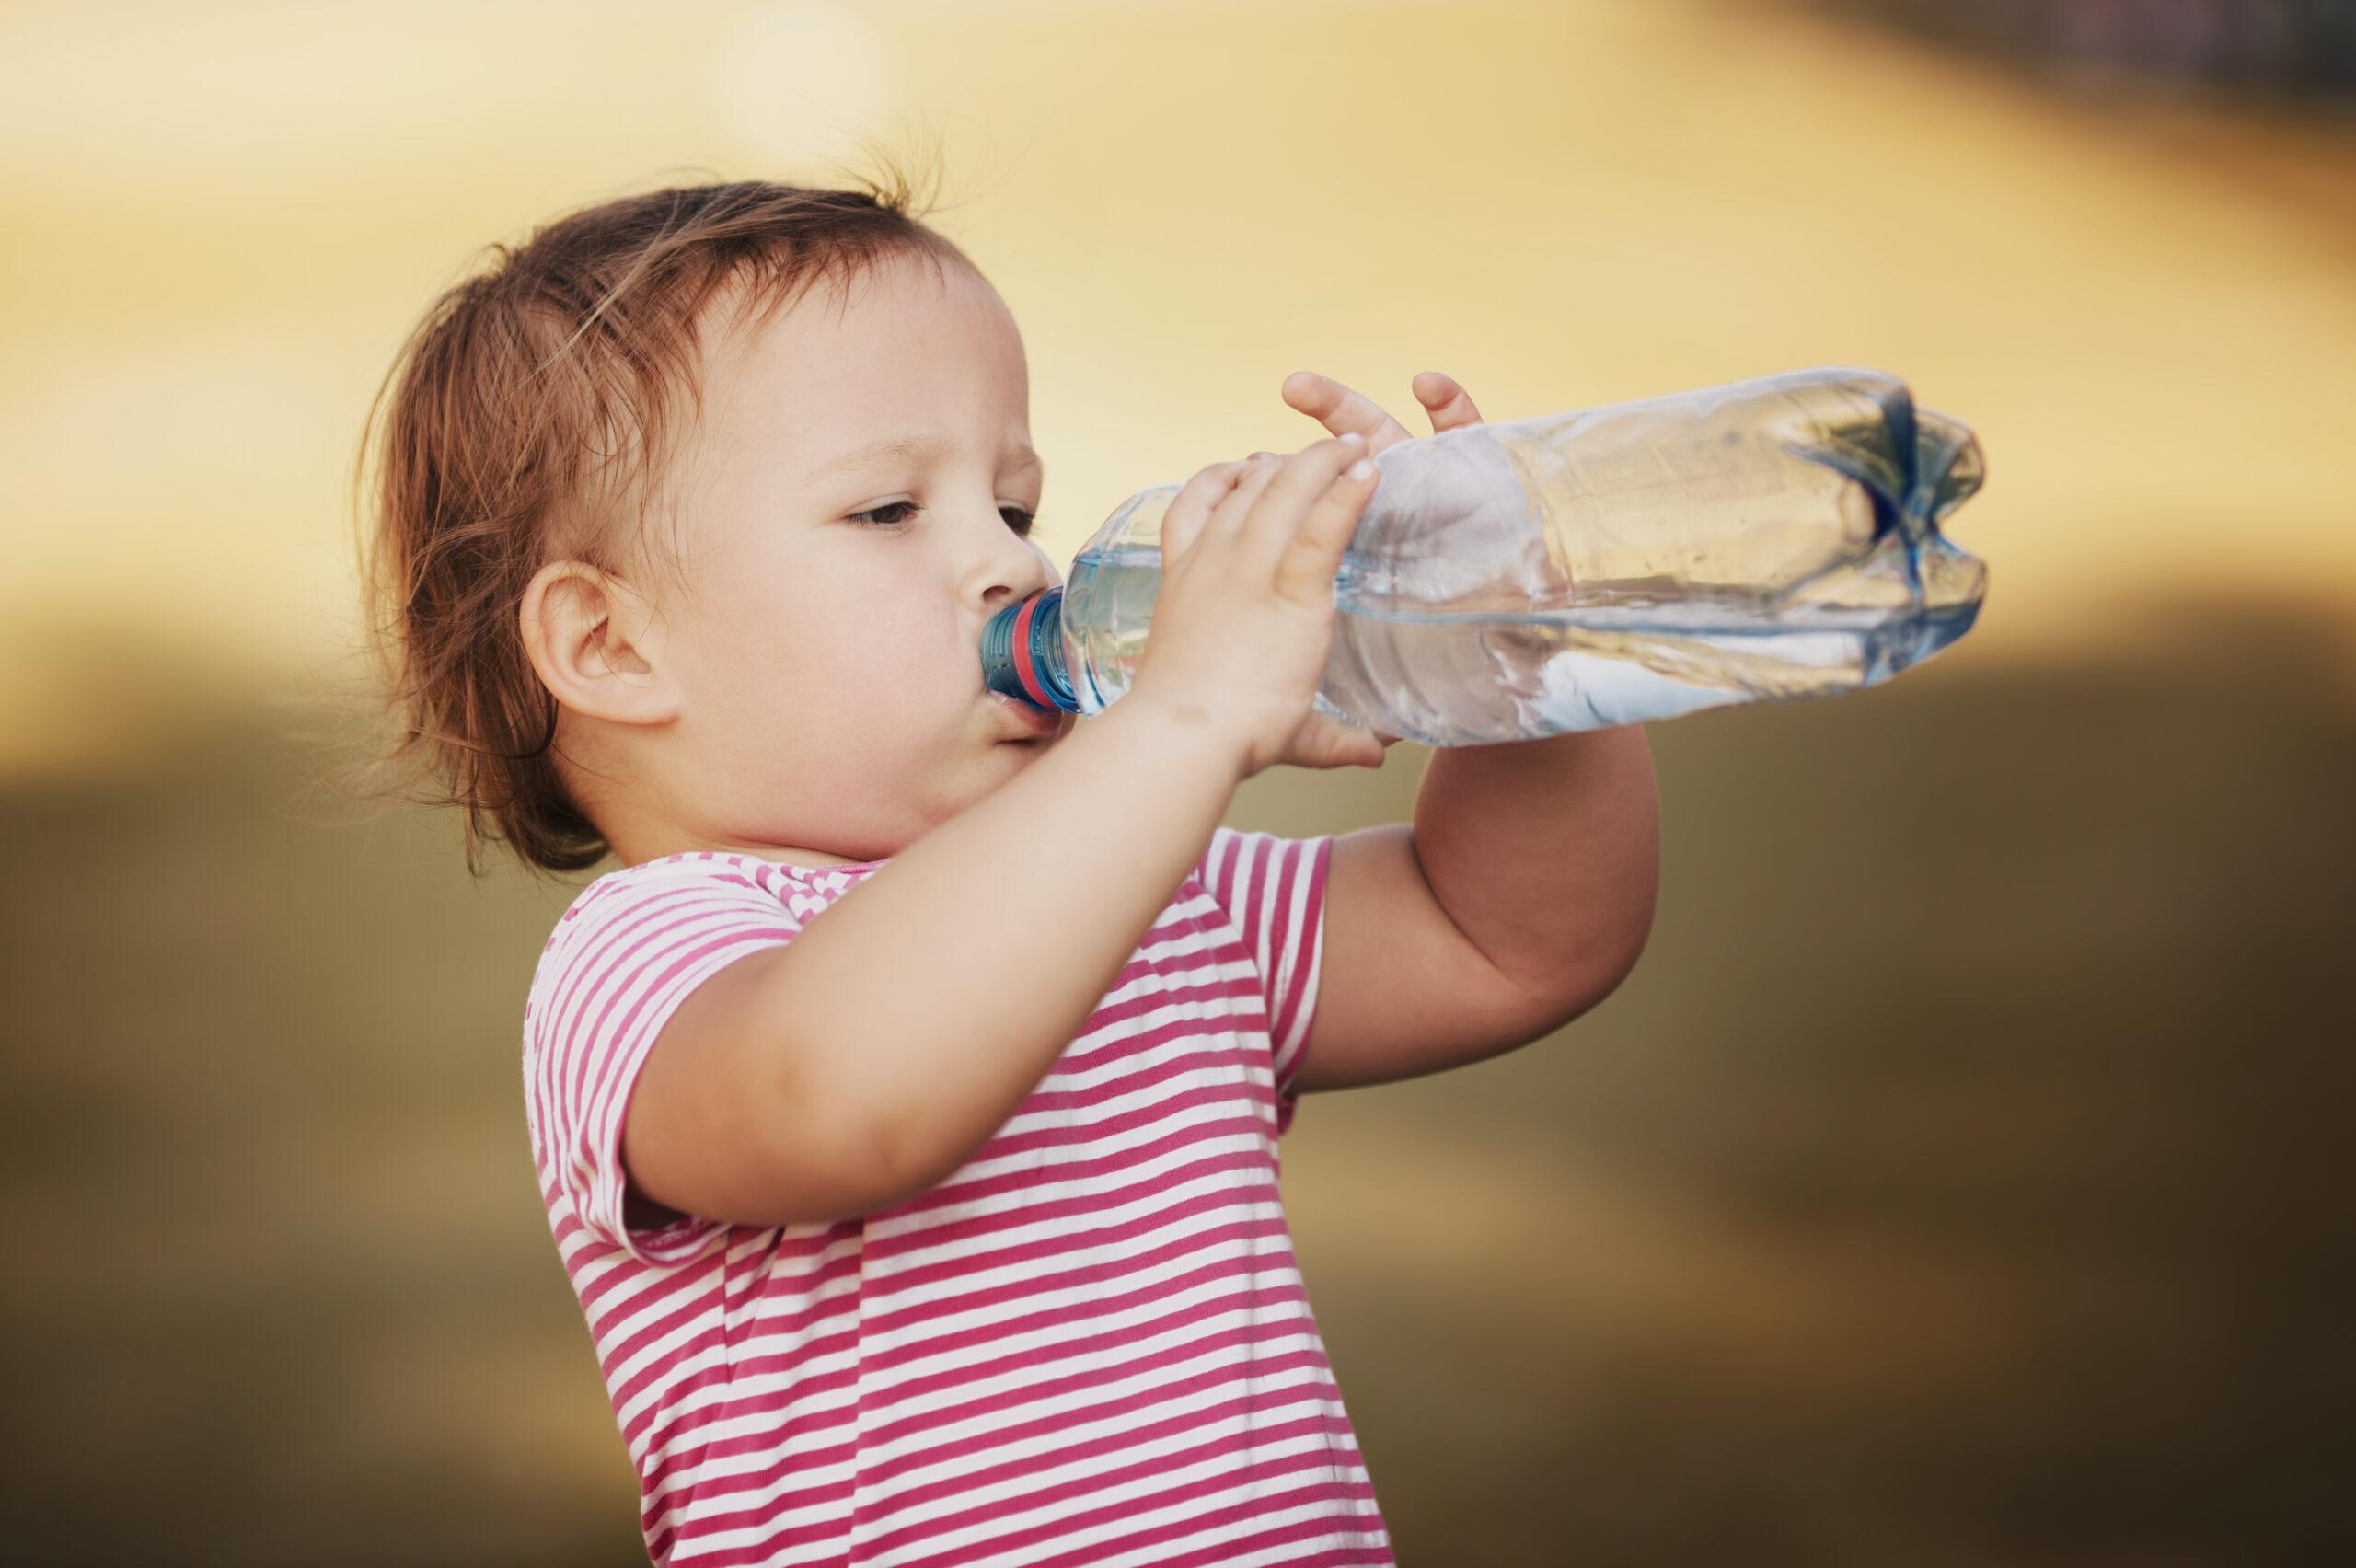 little girl drinking water from a plastic bottle